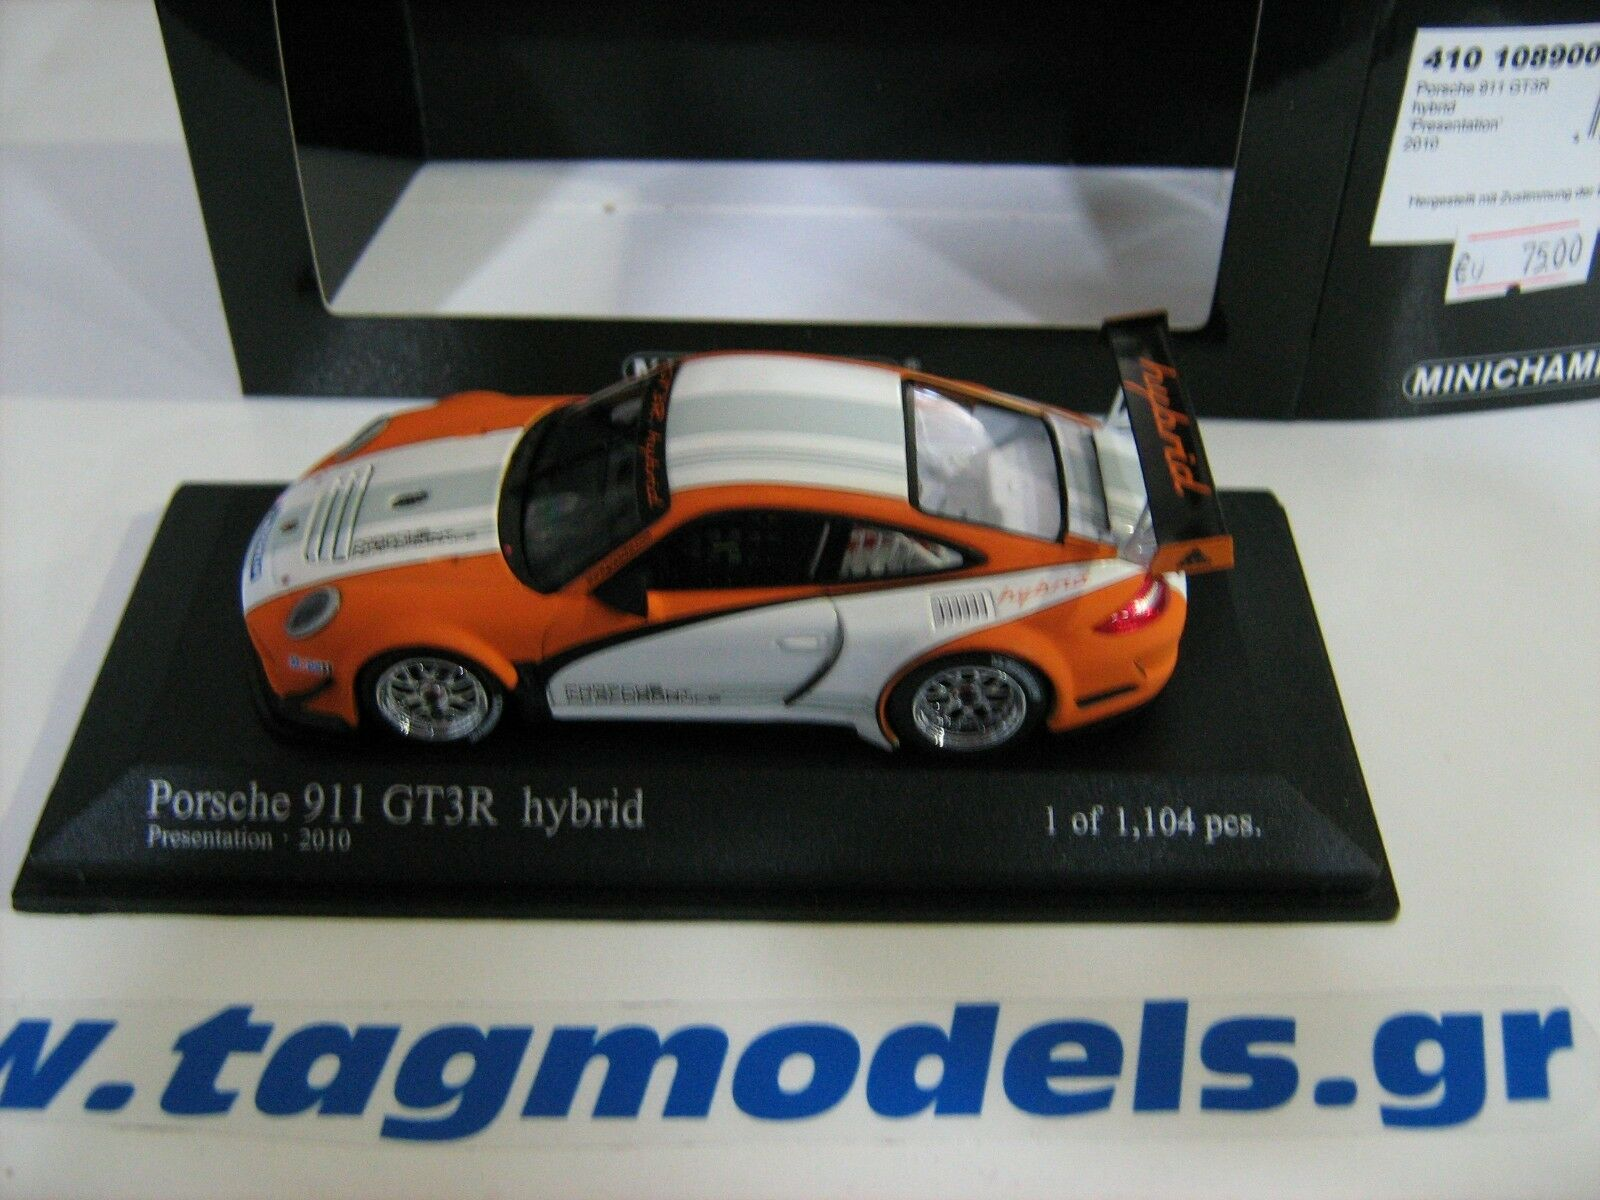 MINICHAMPS 1 1 1 43 PORSCHE  911 GT3R HYBRID 2010 BRAND NEW -BOXED bec332